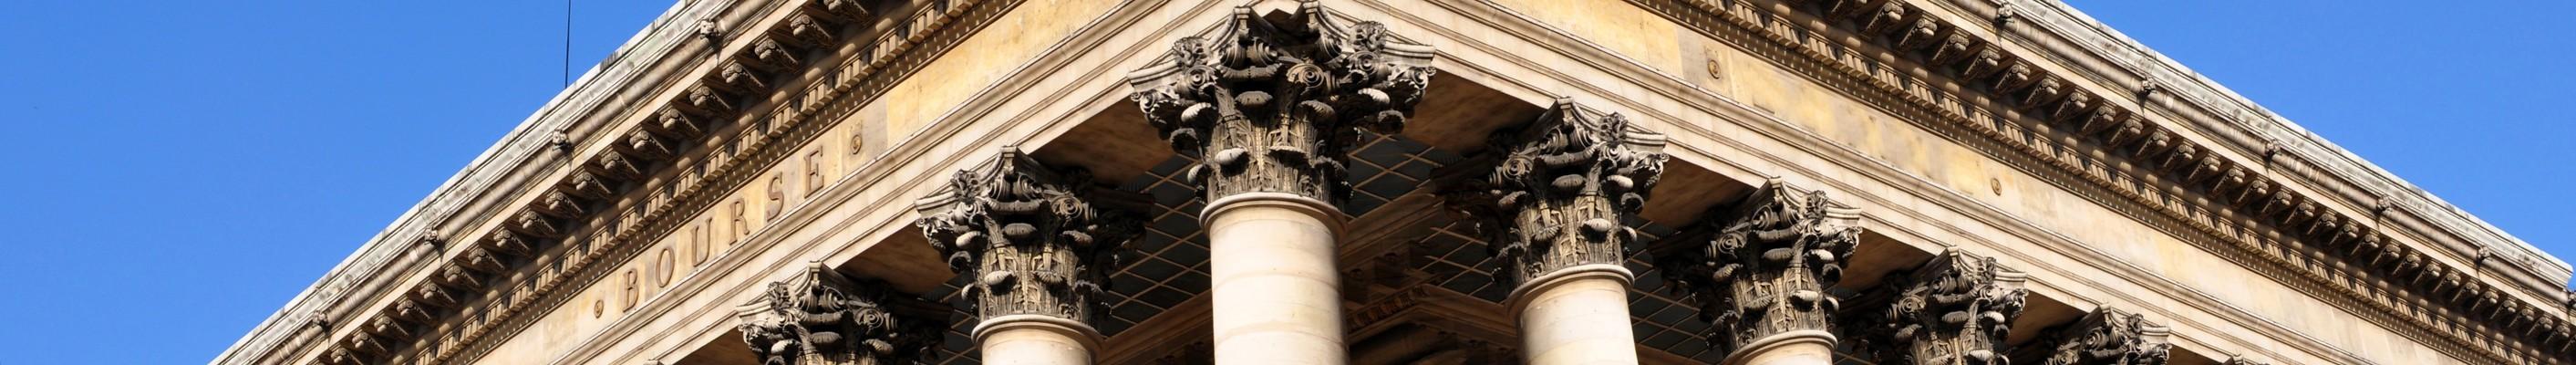 palais brongniart bourse